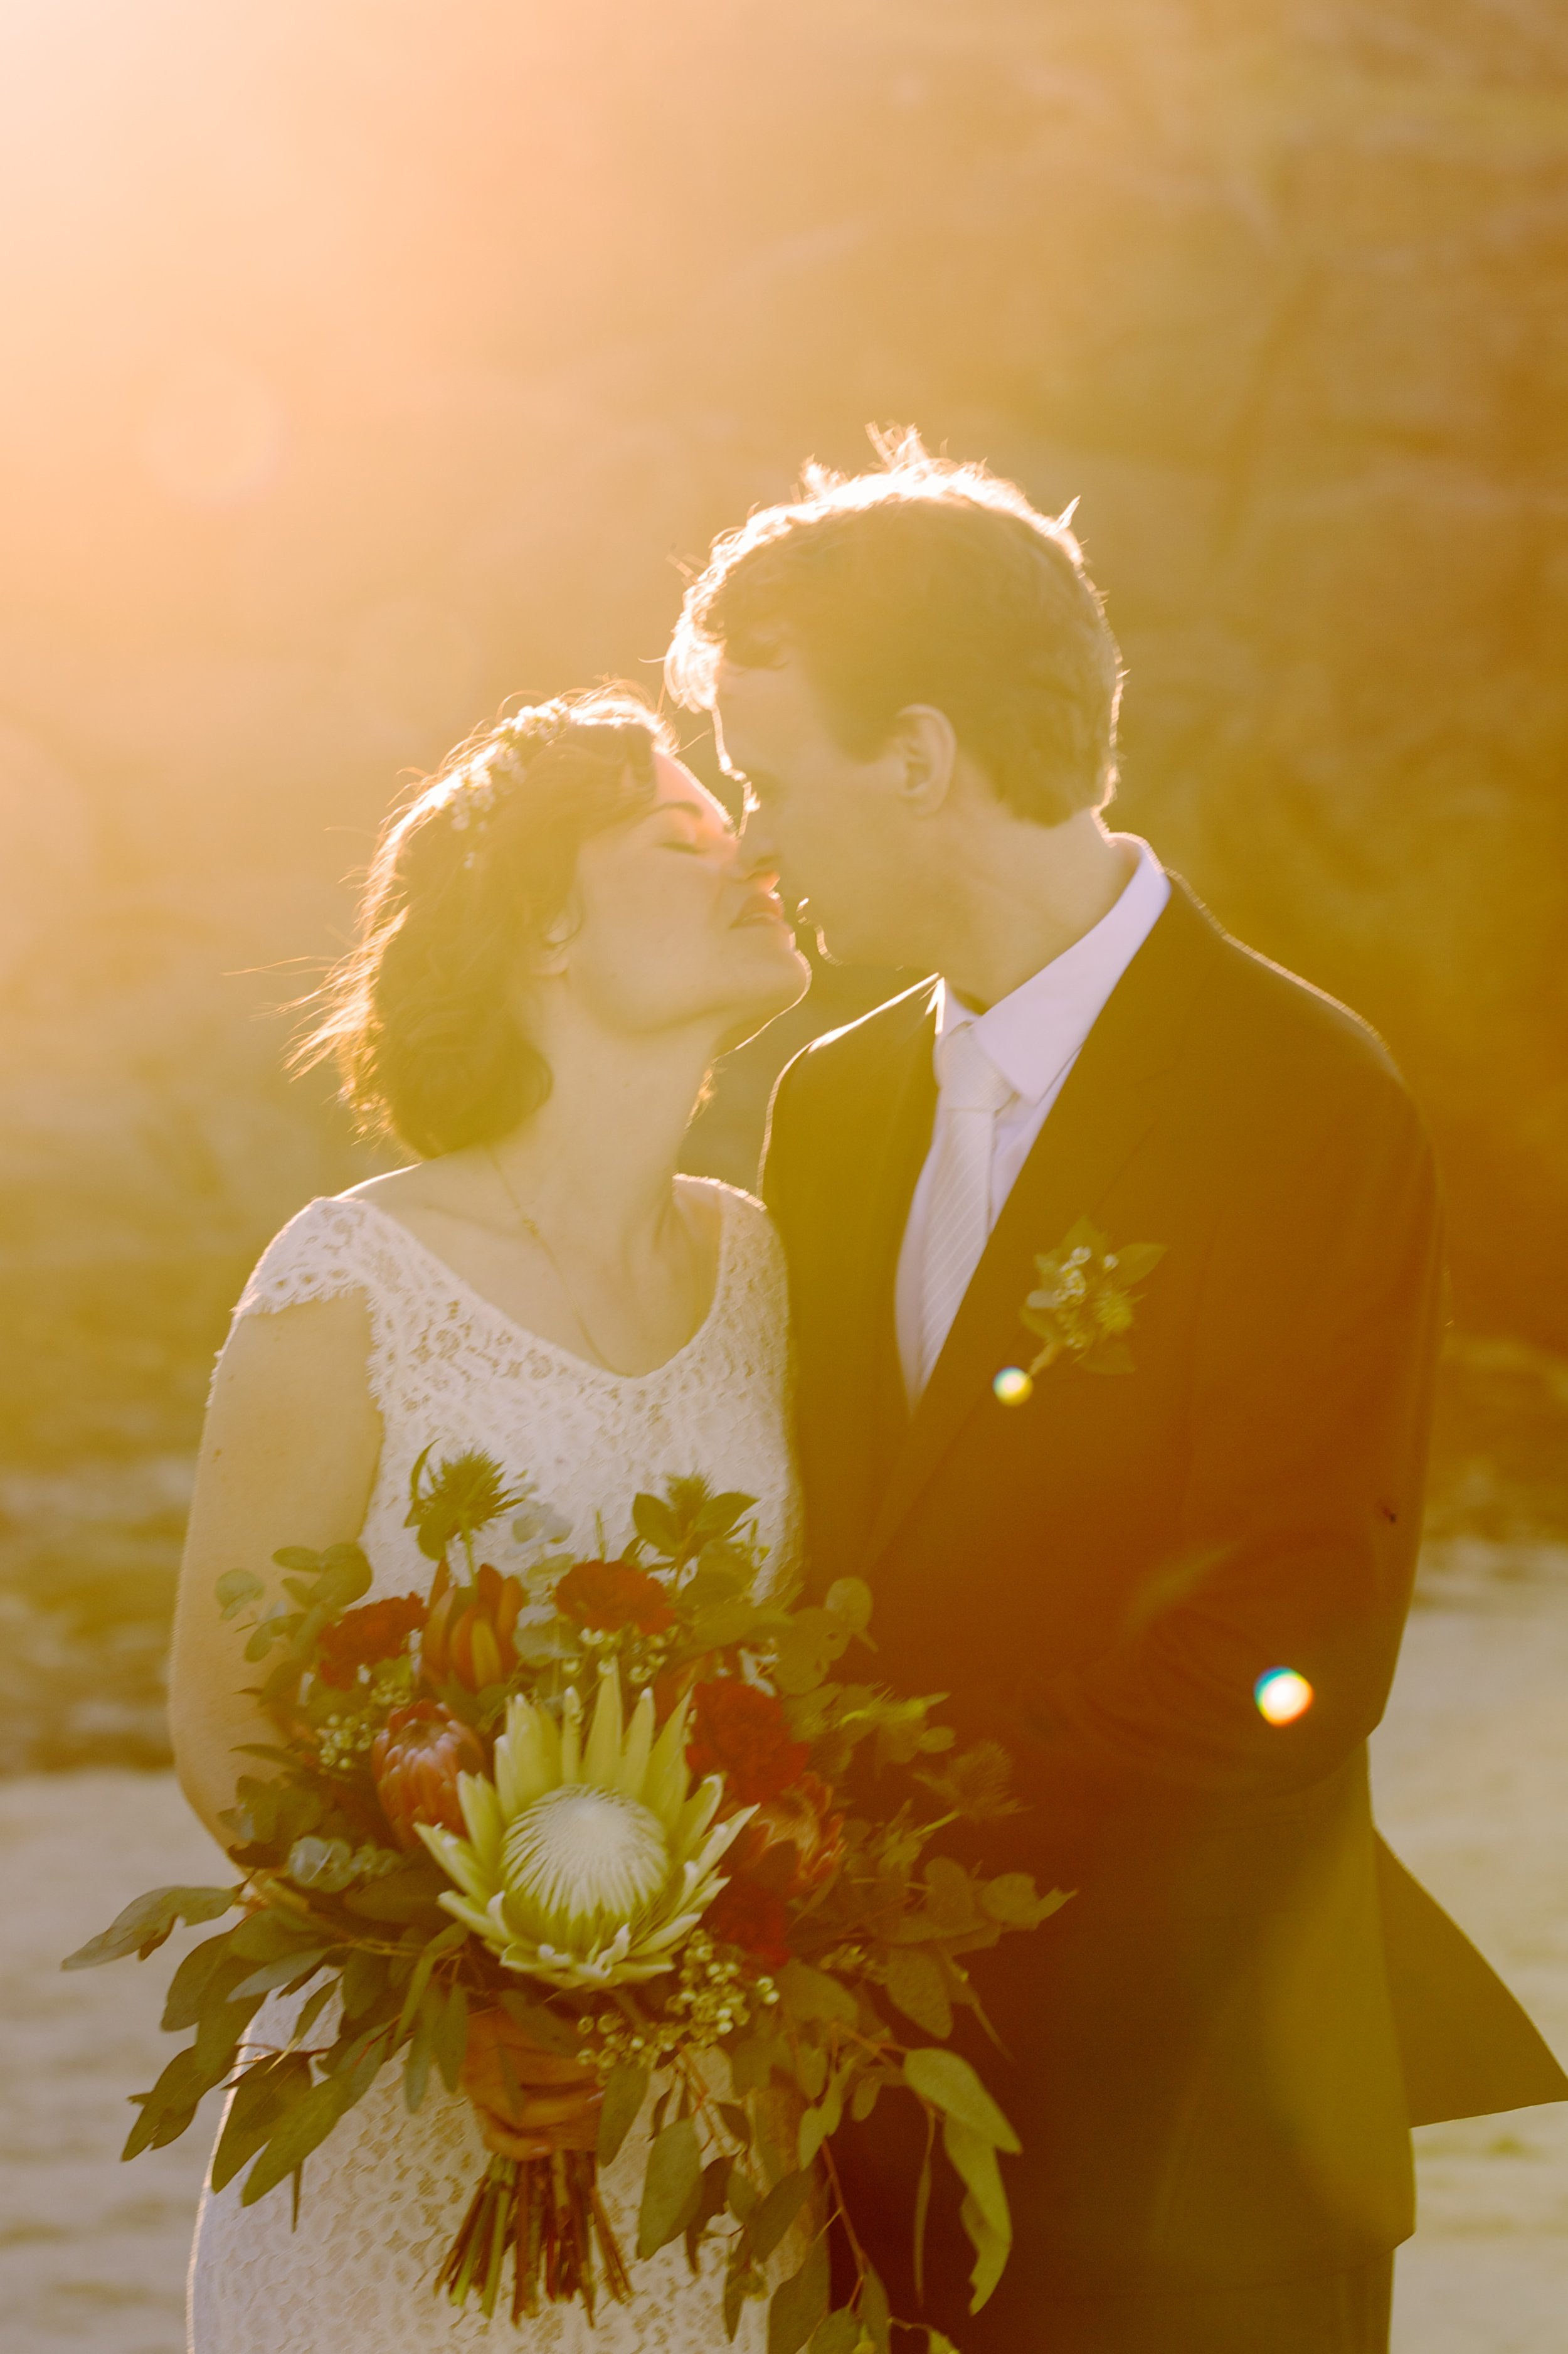 Jochen_Christina_Cabarita_Wedding_271.jpg